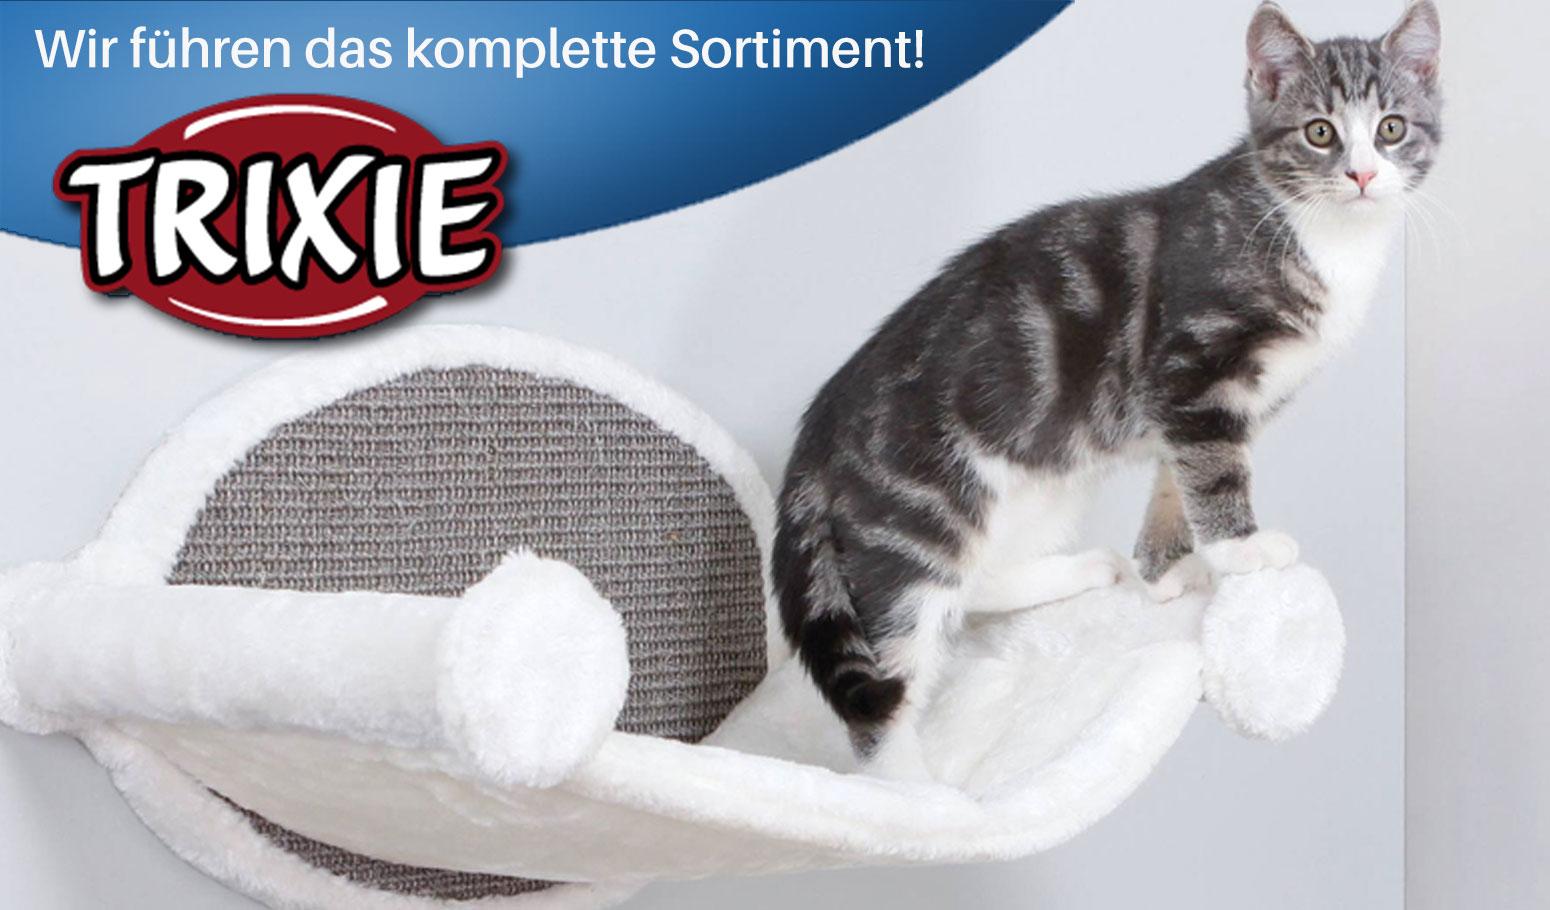 Trixie Katzenzubehör Katzenshop